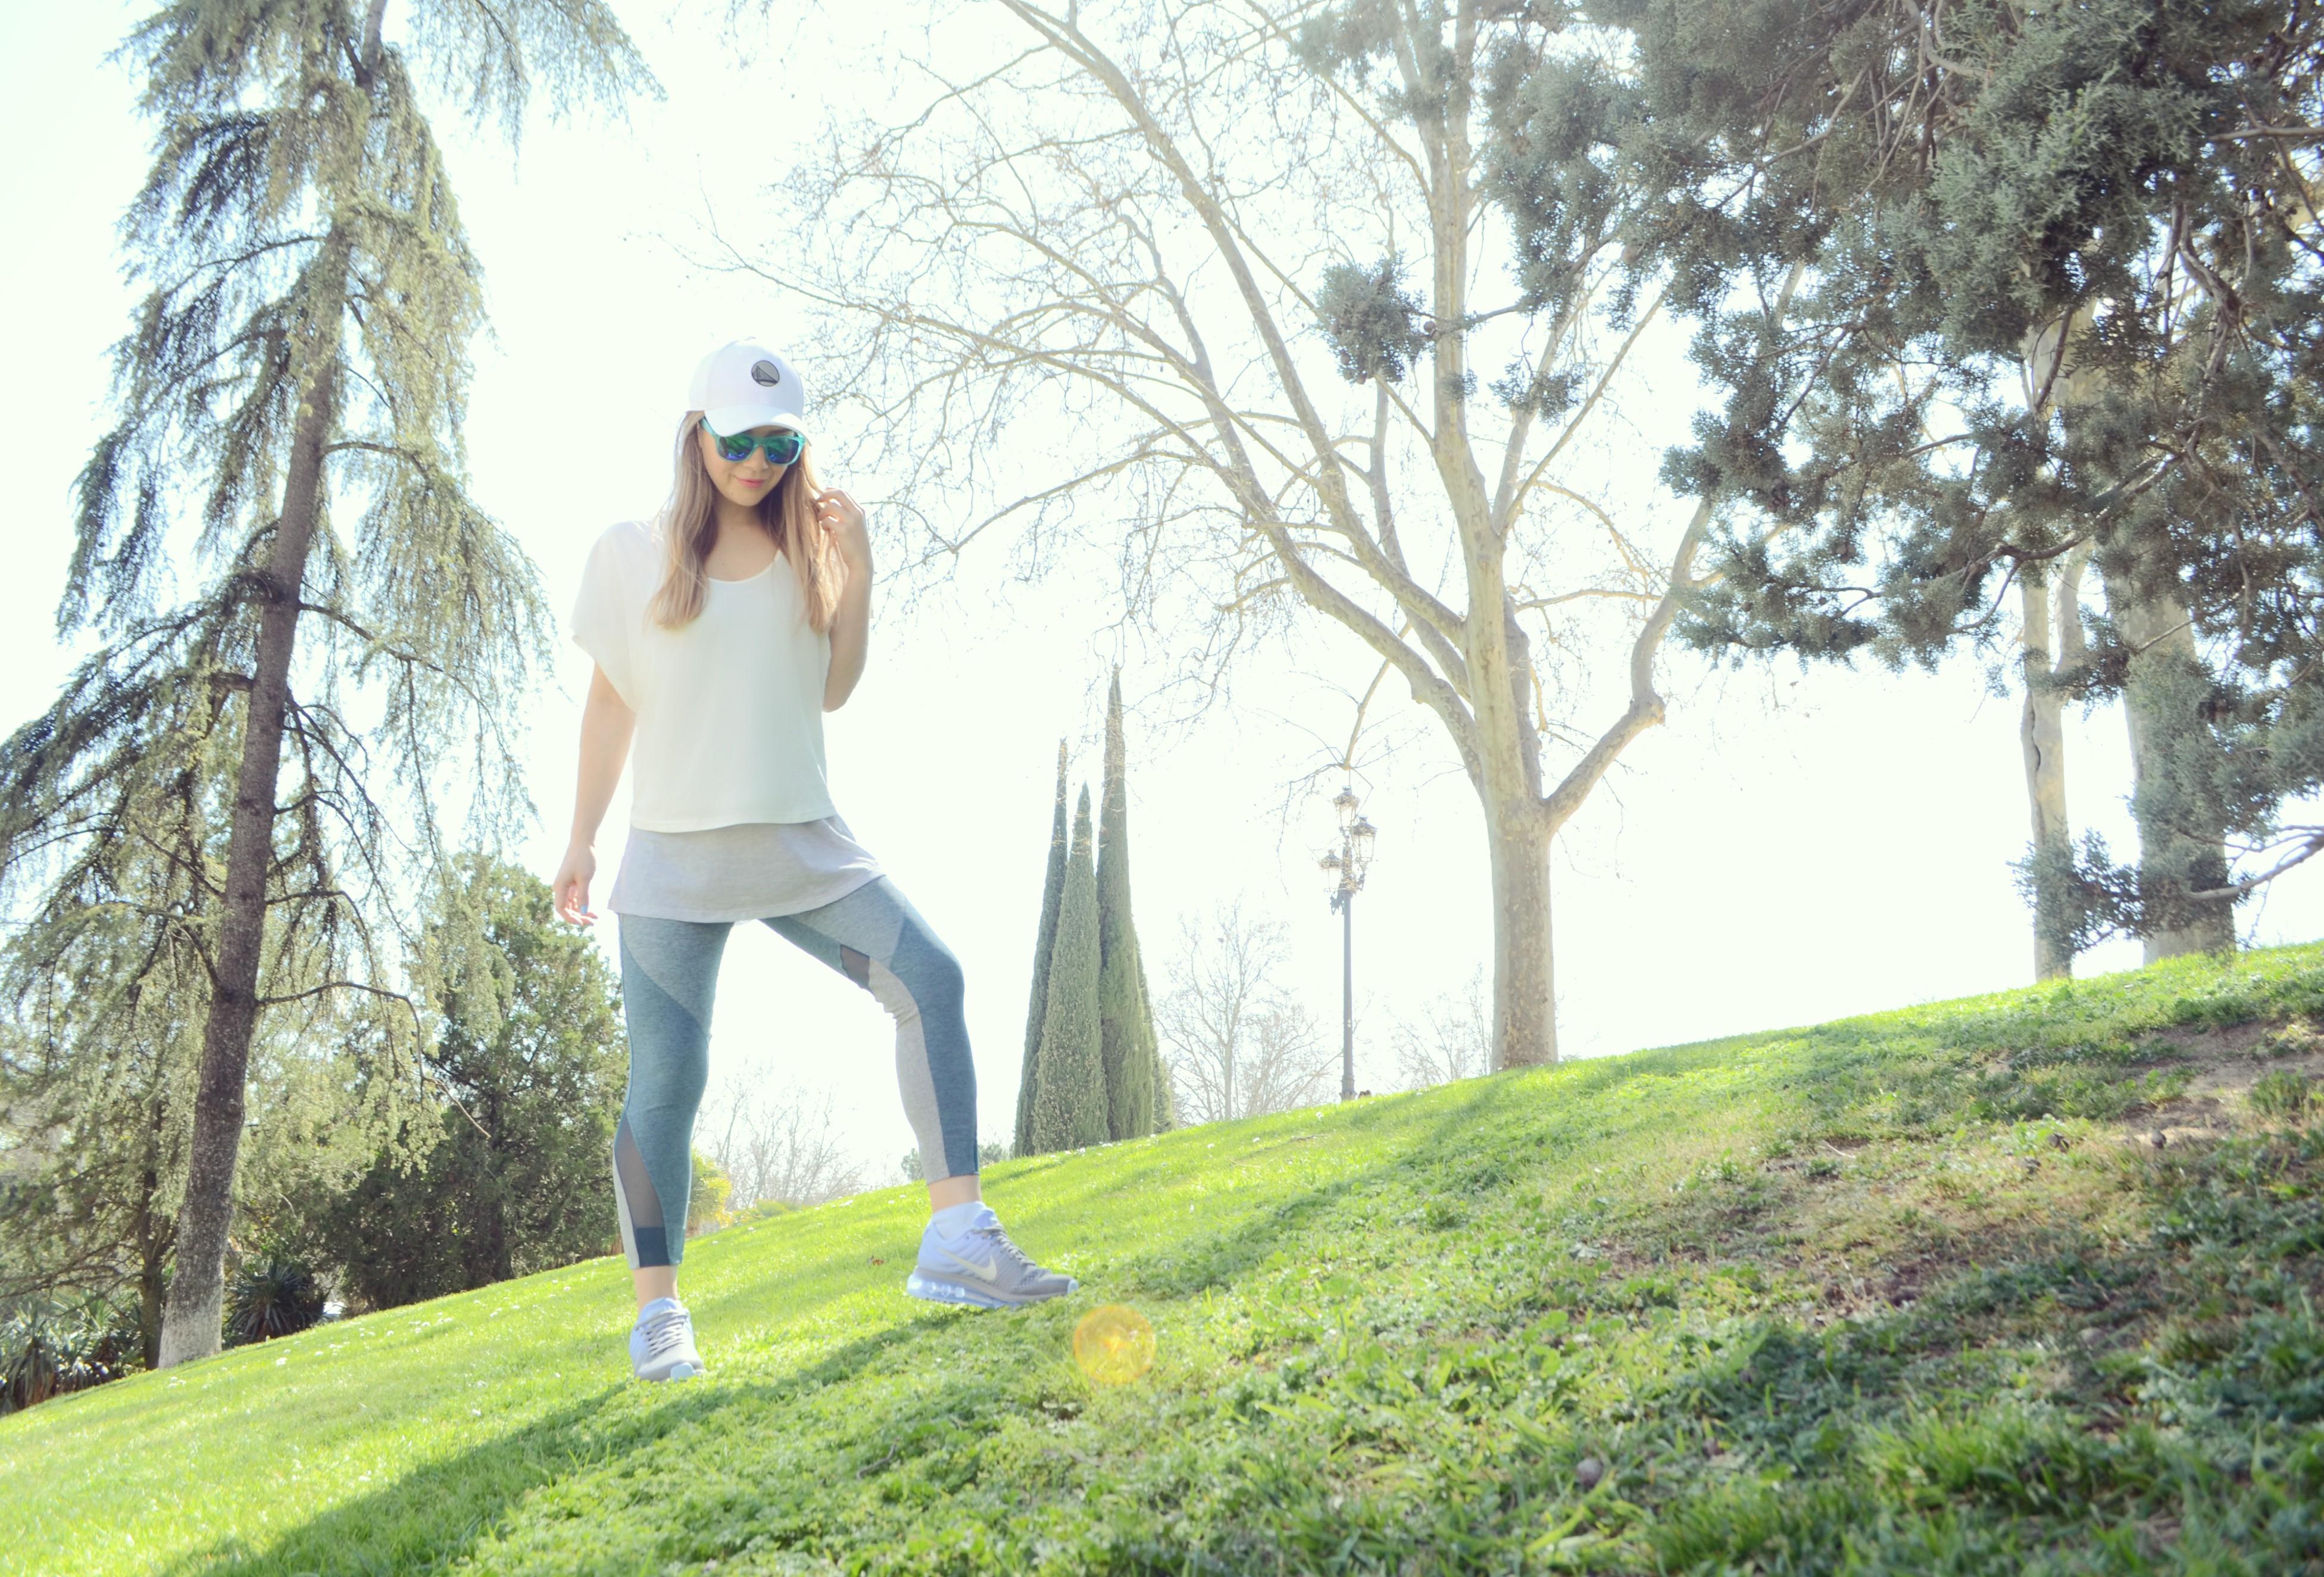 Blog-de-moda-ChicAdicta-JDSports-Espana-Nike-Air-Max-2017-Chic-Adicta-look-para-correr-oysho-fashion-fitness-PiensaenChic-Piensa-en-Chic